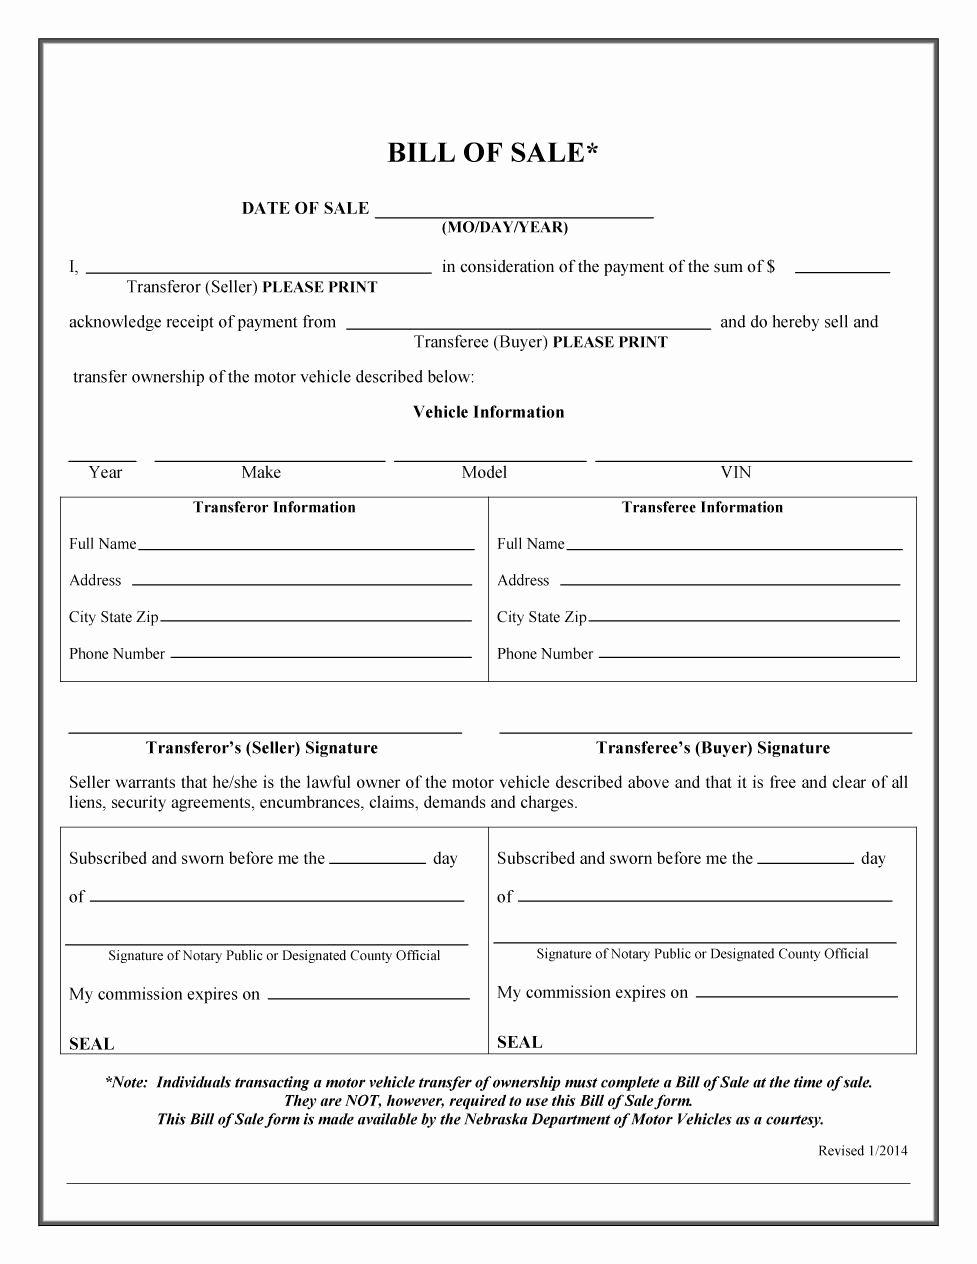 Bill Of Sale Printable Elegant 45 Fee Printable Bill Of Sale Templates Car Boat Gun